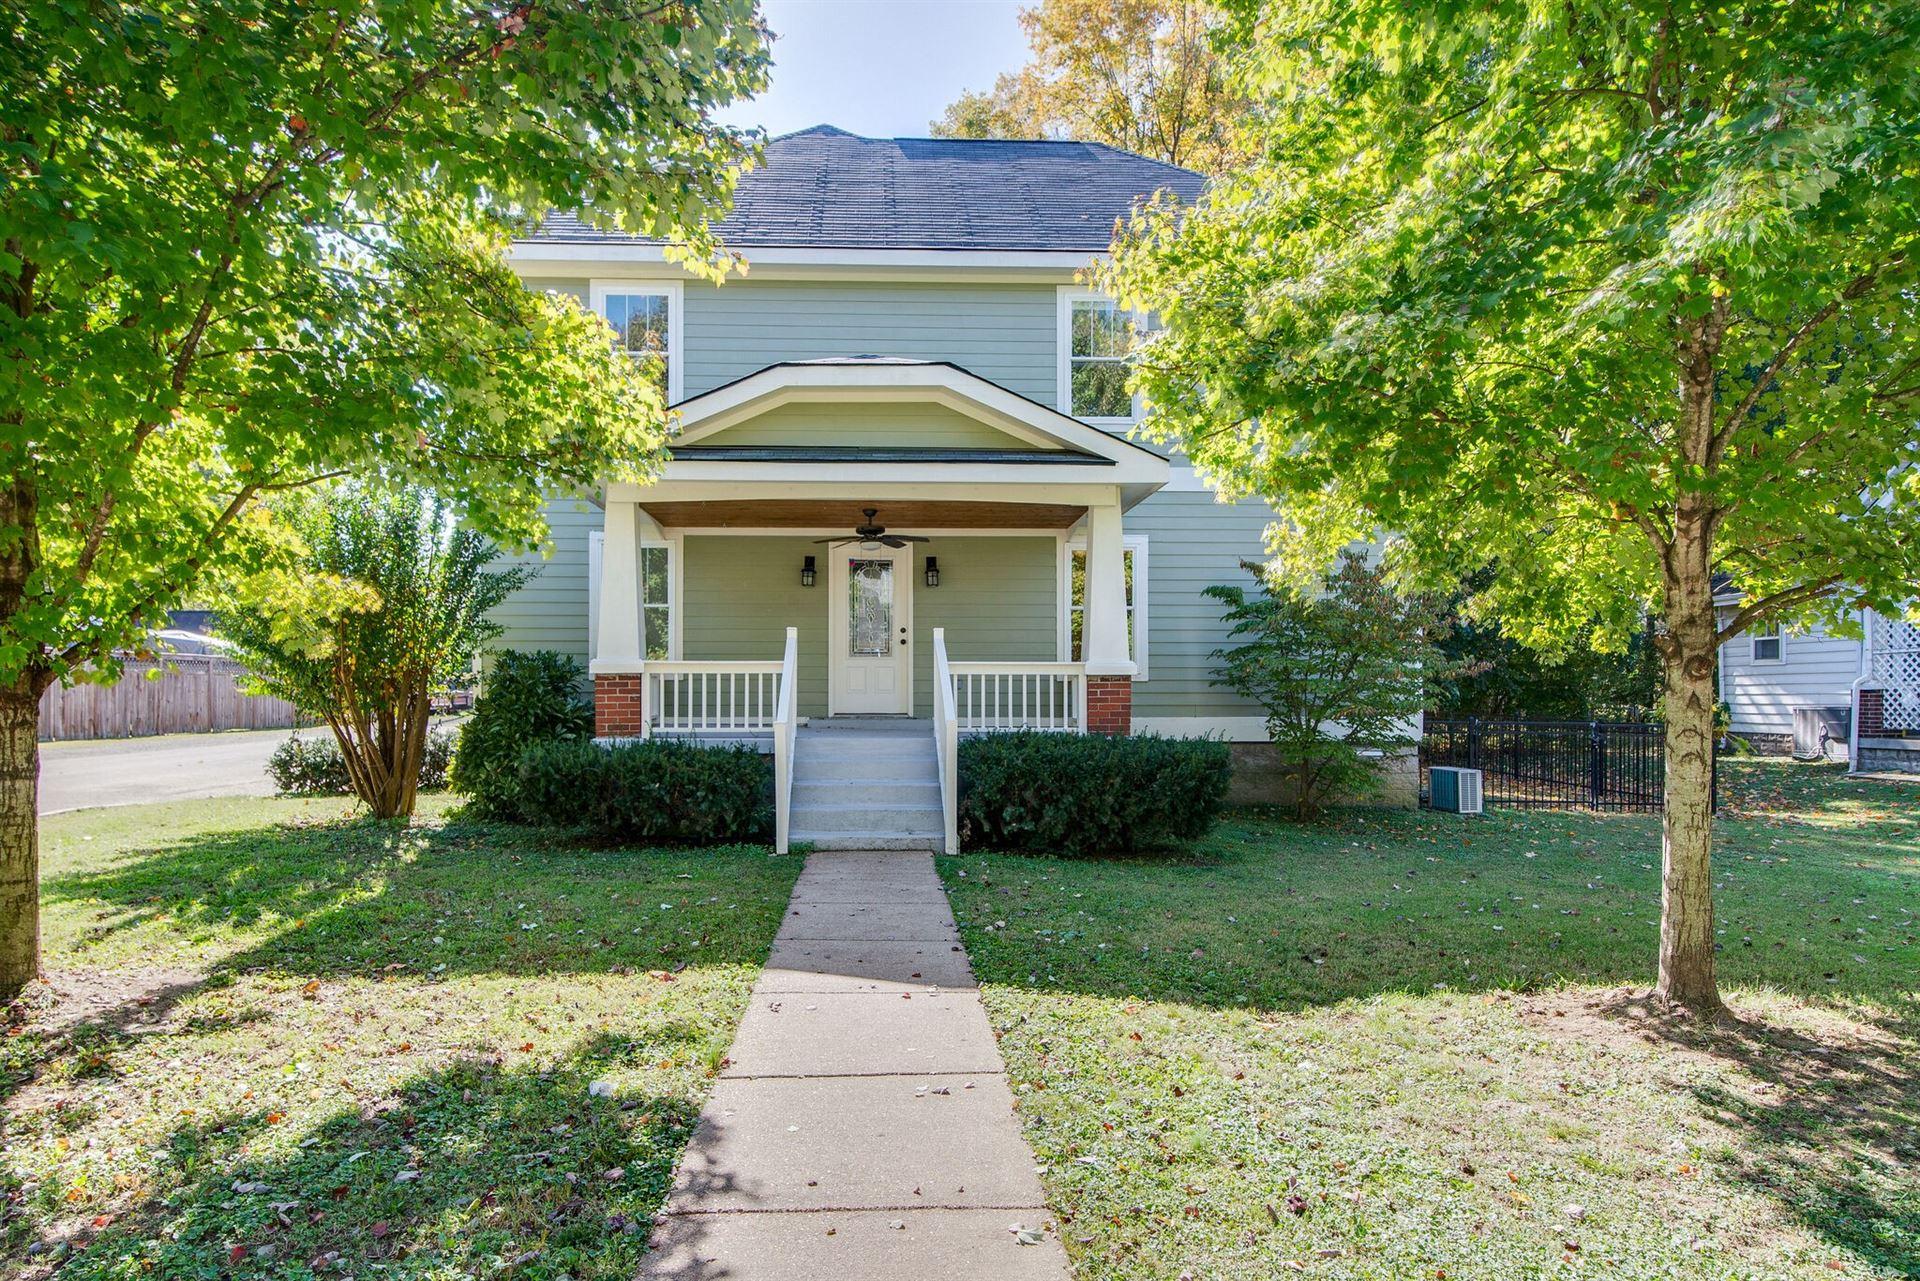 Photo of 4901 Dakota Ave, Nashville, TN 37209 (MLS # 2202397)